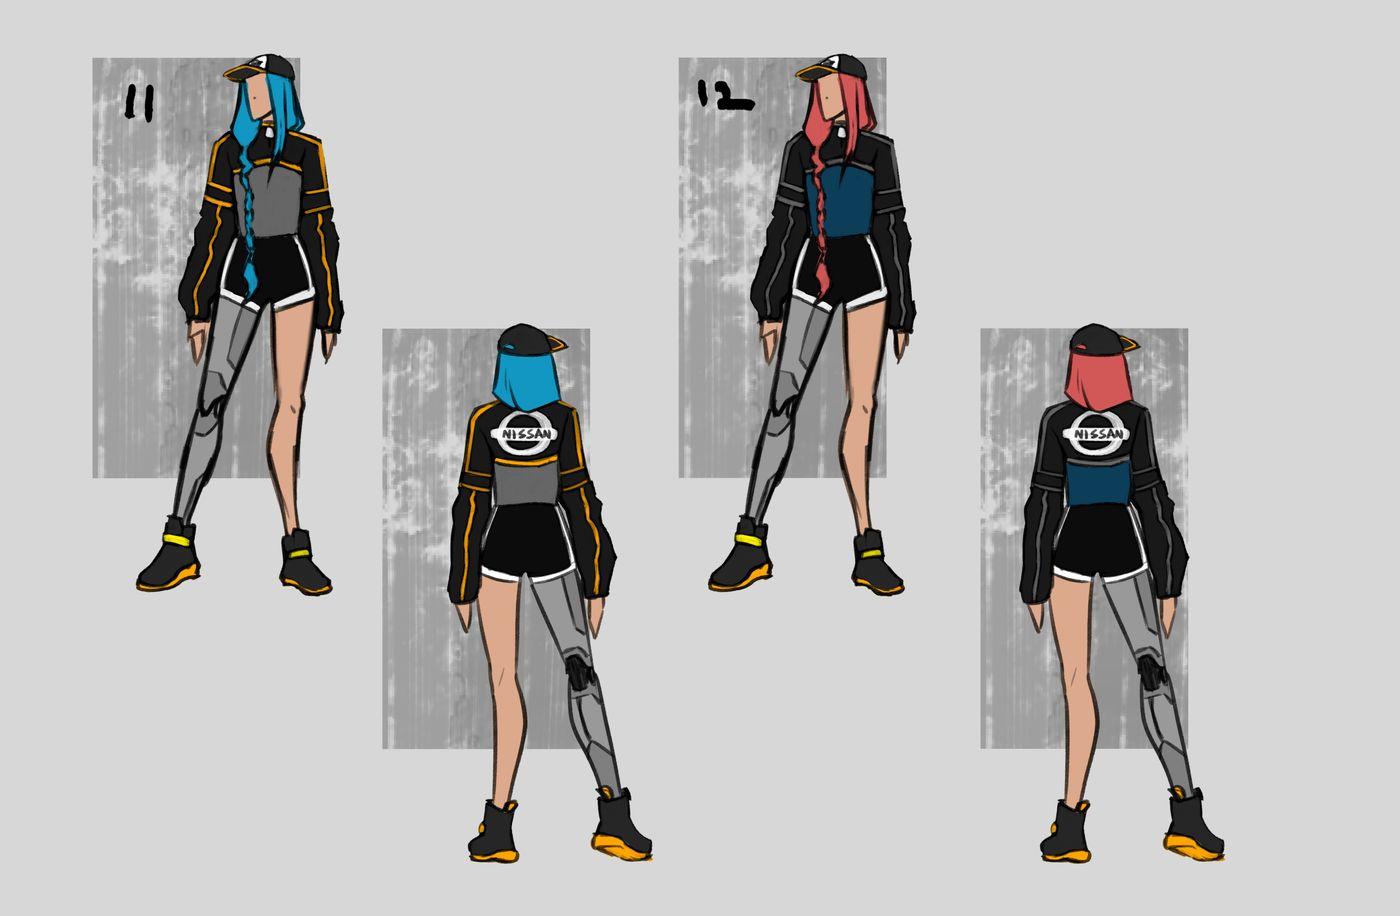 Steer Jasmine %20 Scme3420 Rookies %20 Character Design Colour Passes06 Jasminesteer